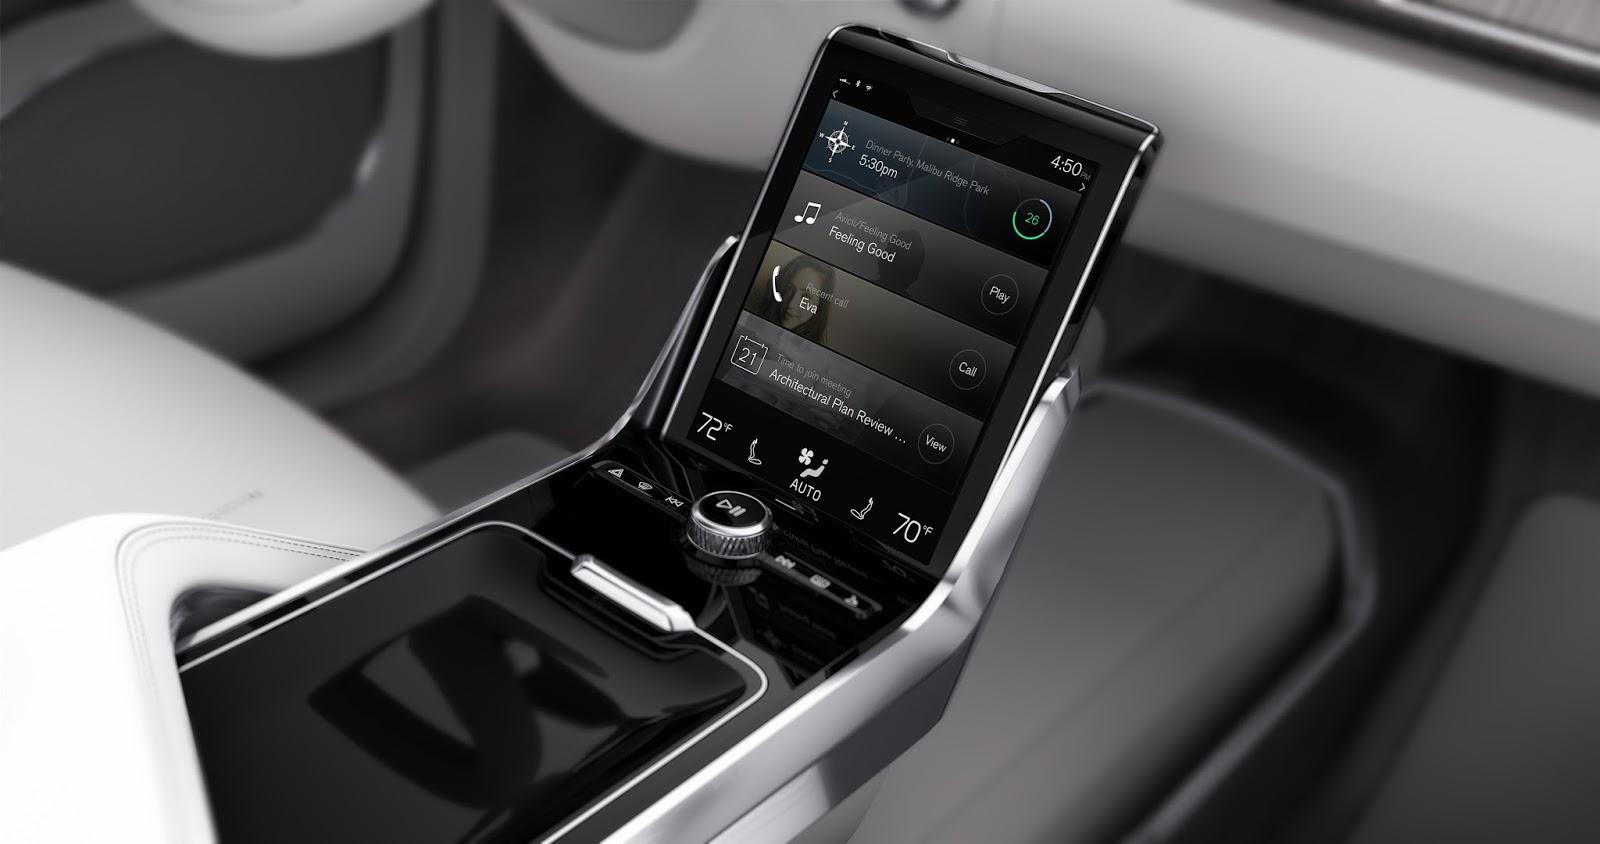 169537 Concept 26 Η Volvo θα κάνει και την αυτόνομη οδήγηση διασκεδαστική Autonomous Driving, Volvo, Volvo XC90, Αυτόνομη οδήγηση